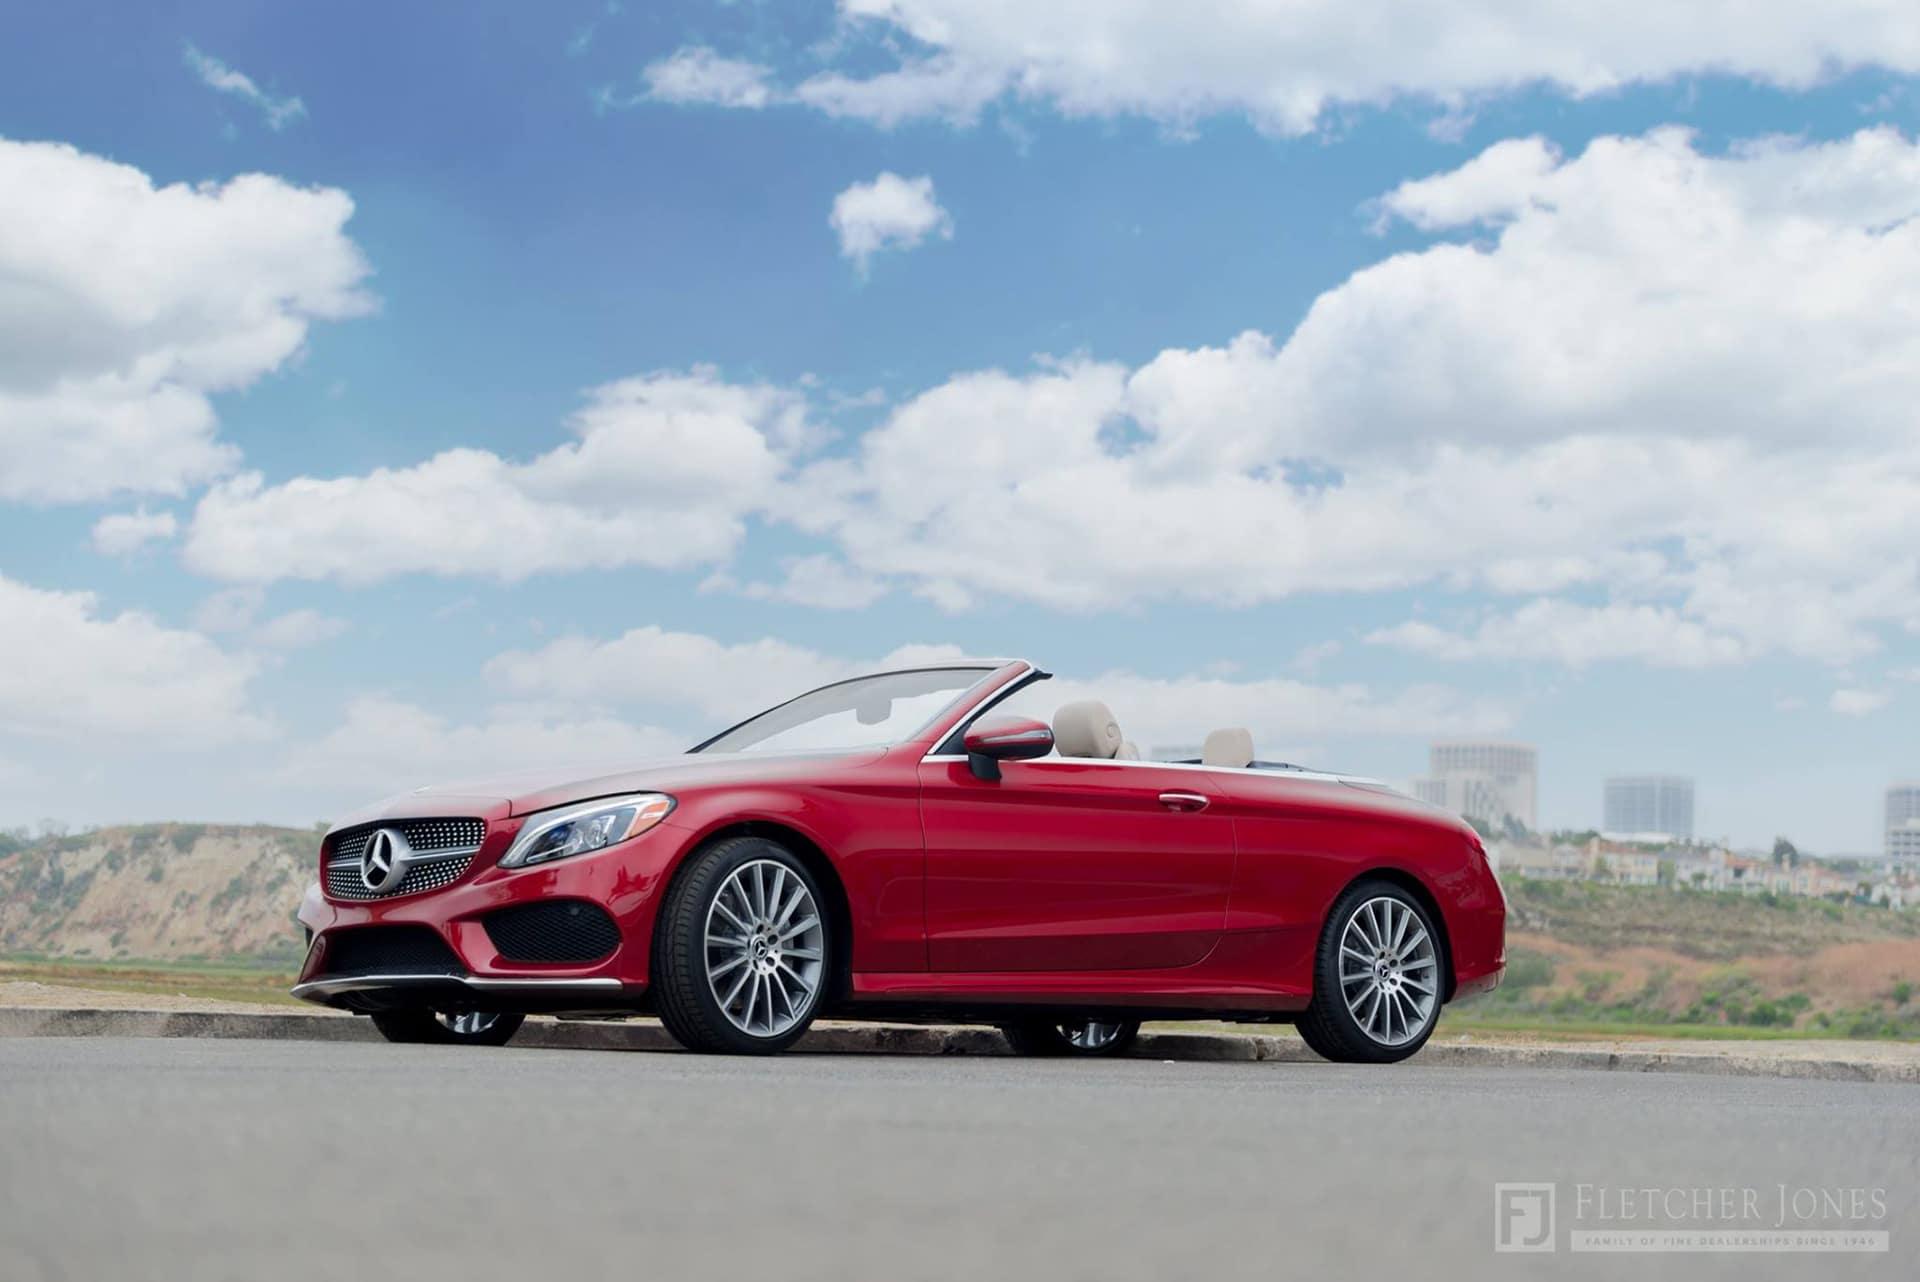 Convertible Mercedes-Benz